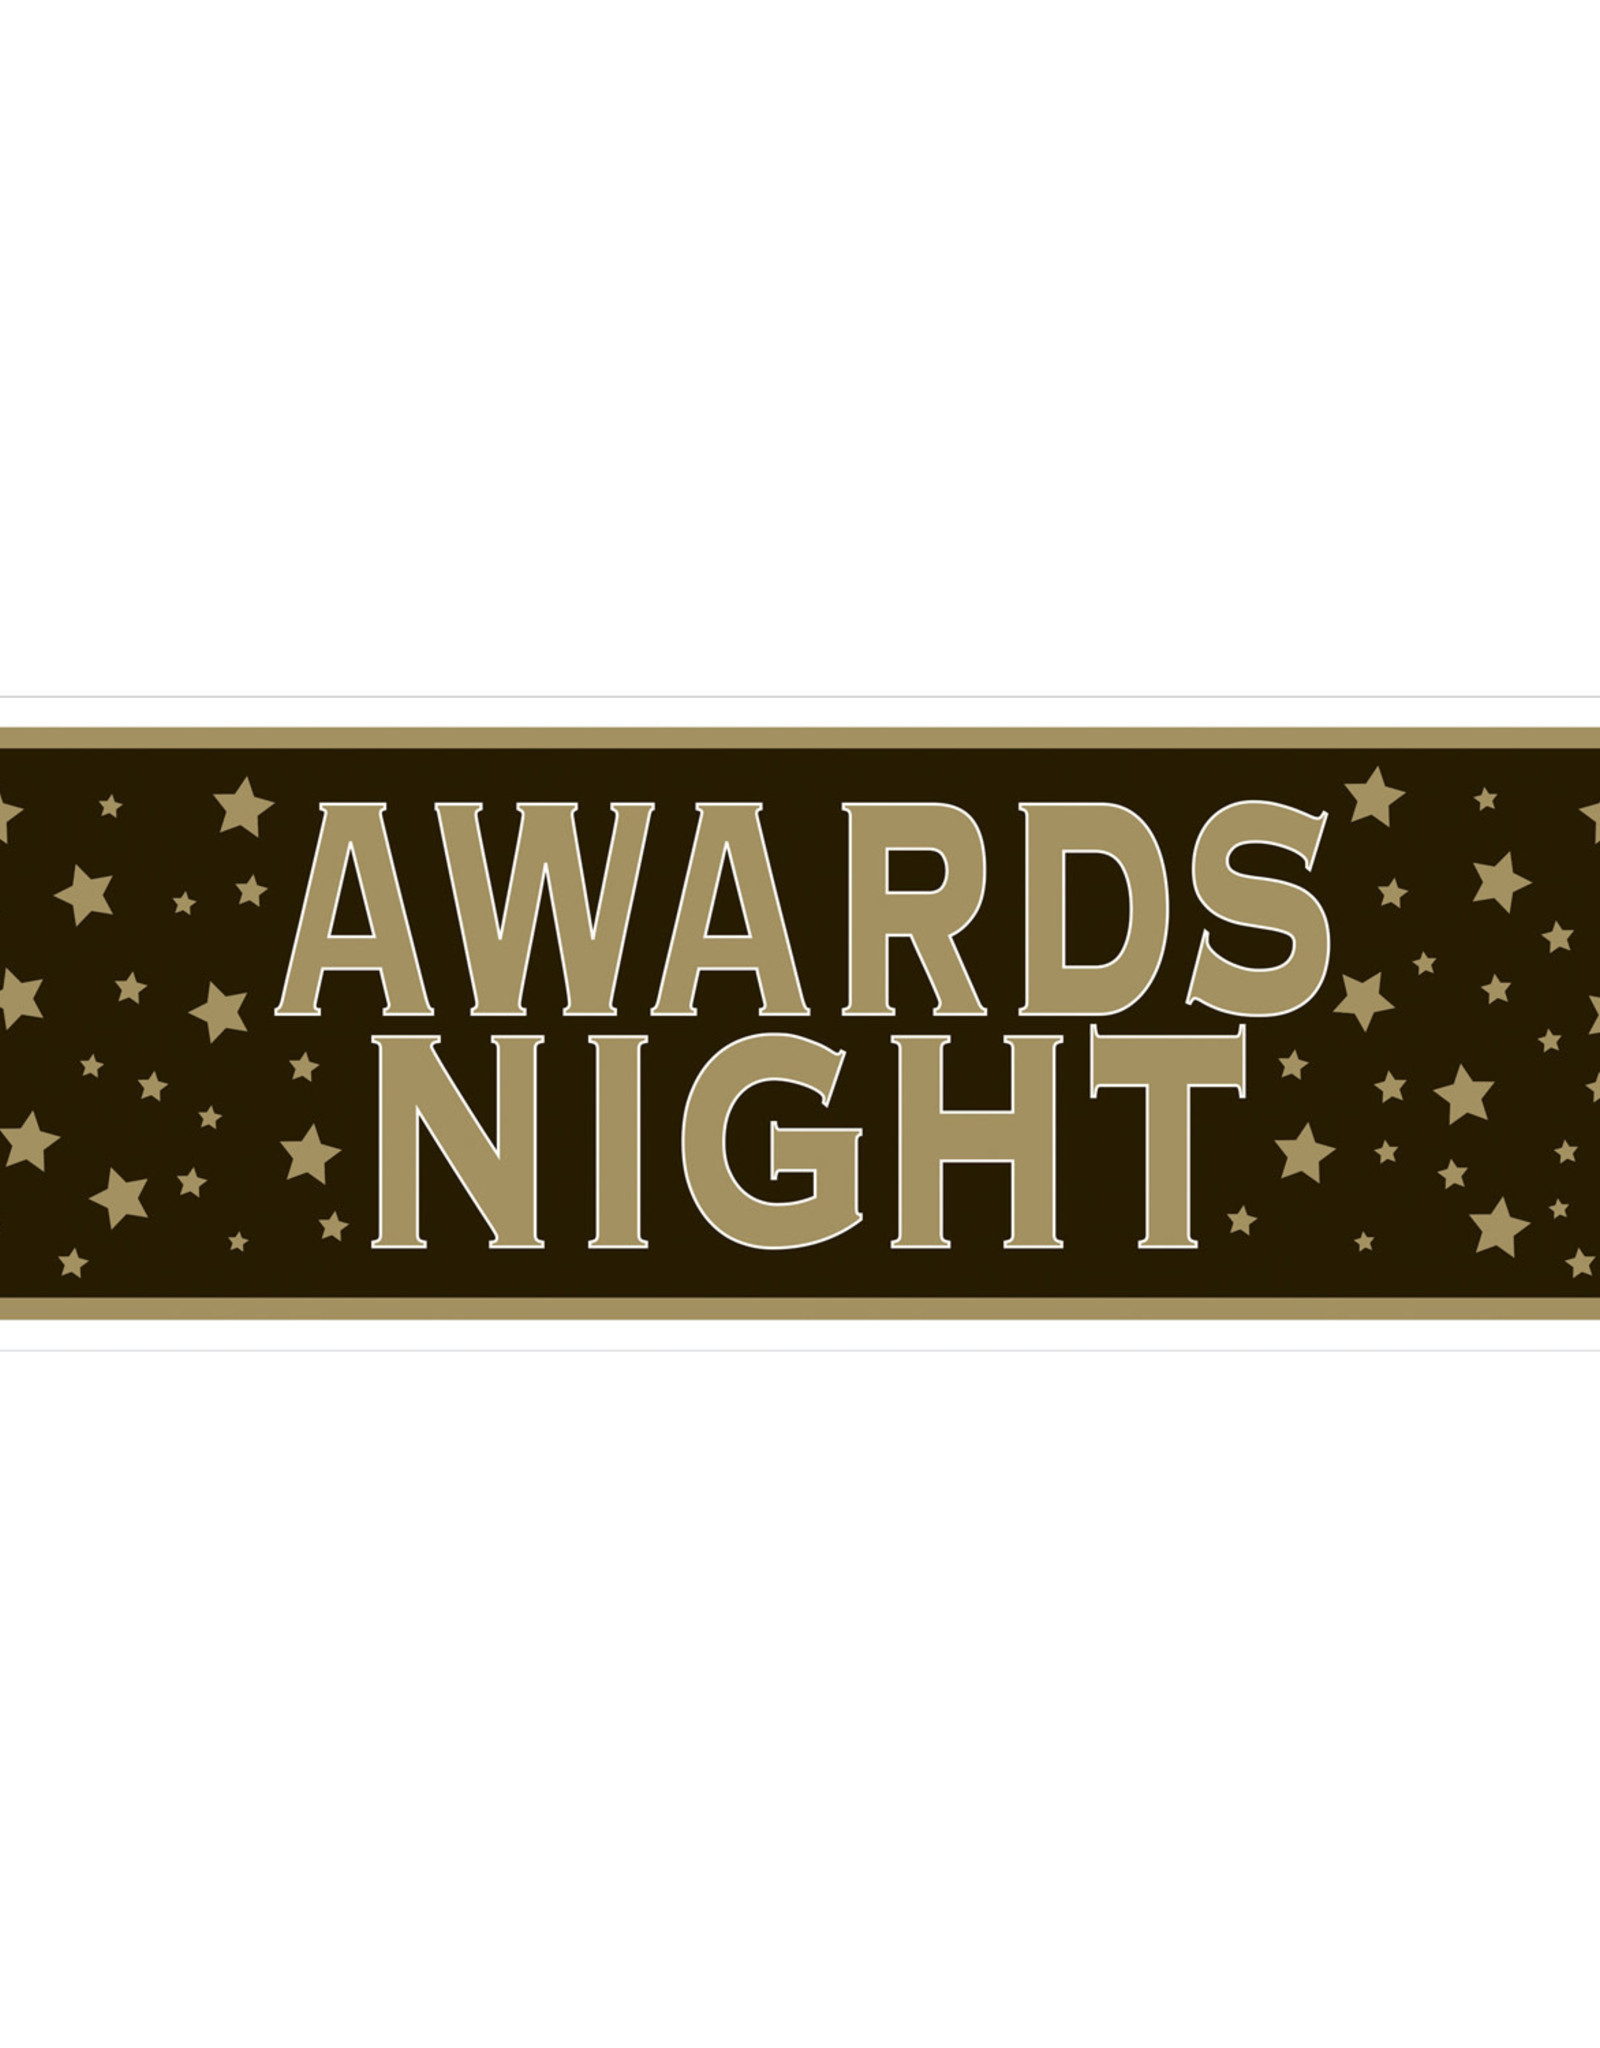 Awards Night Sign Banner